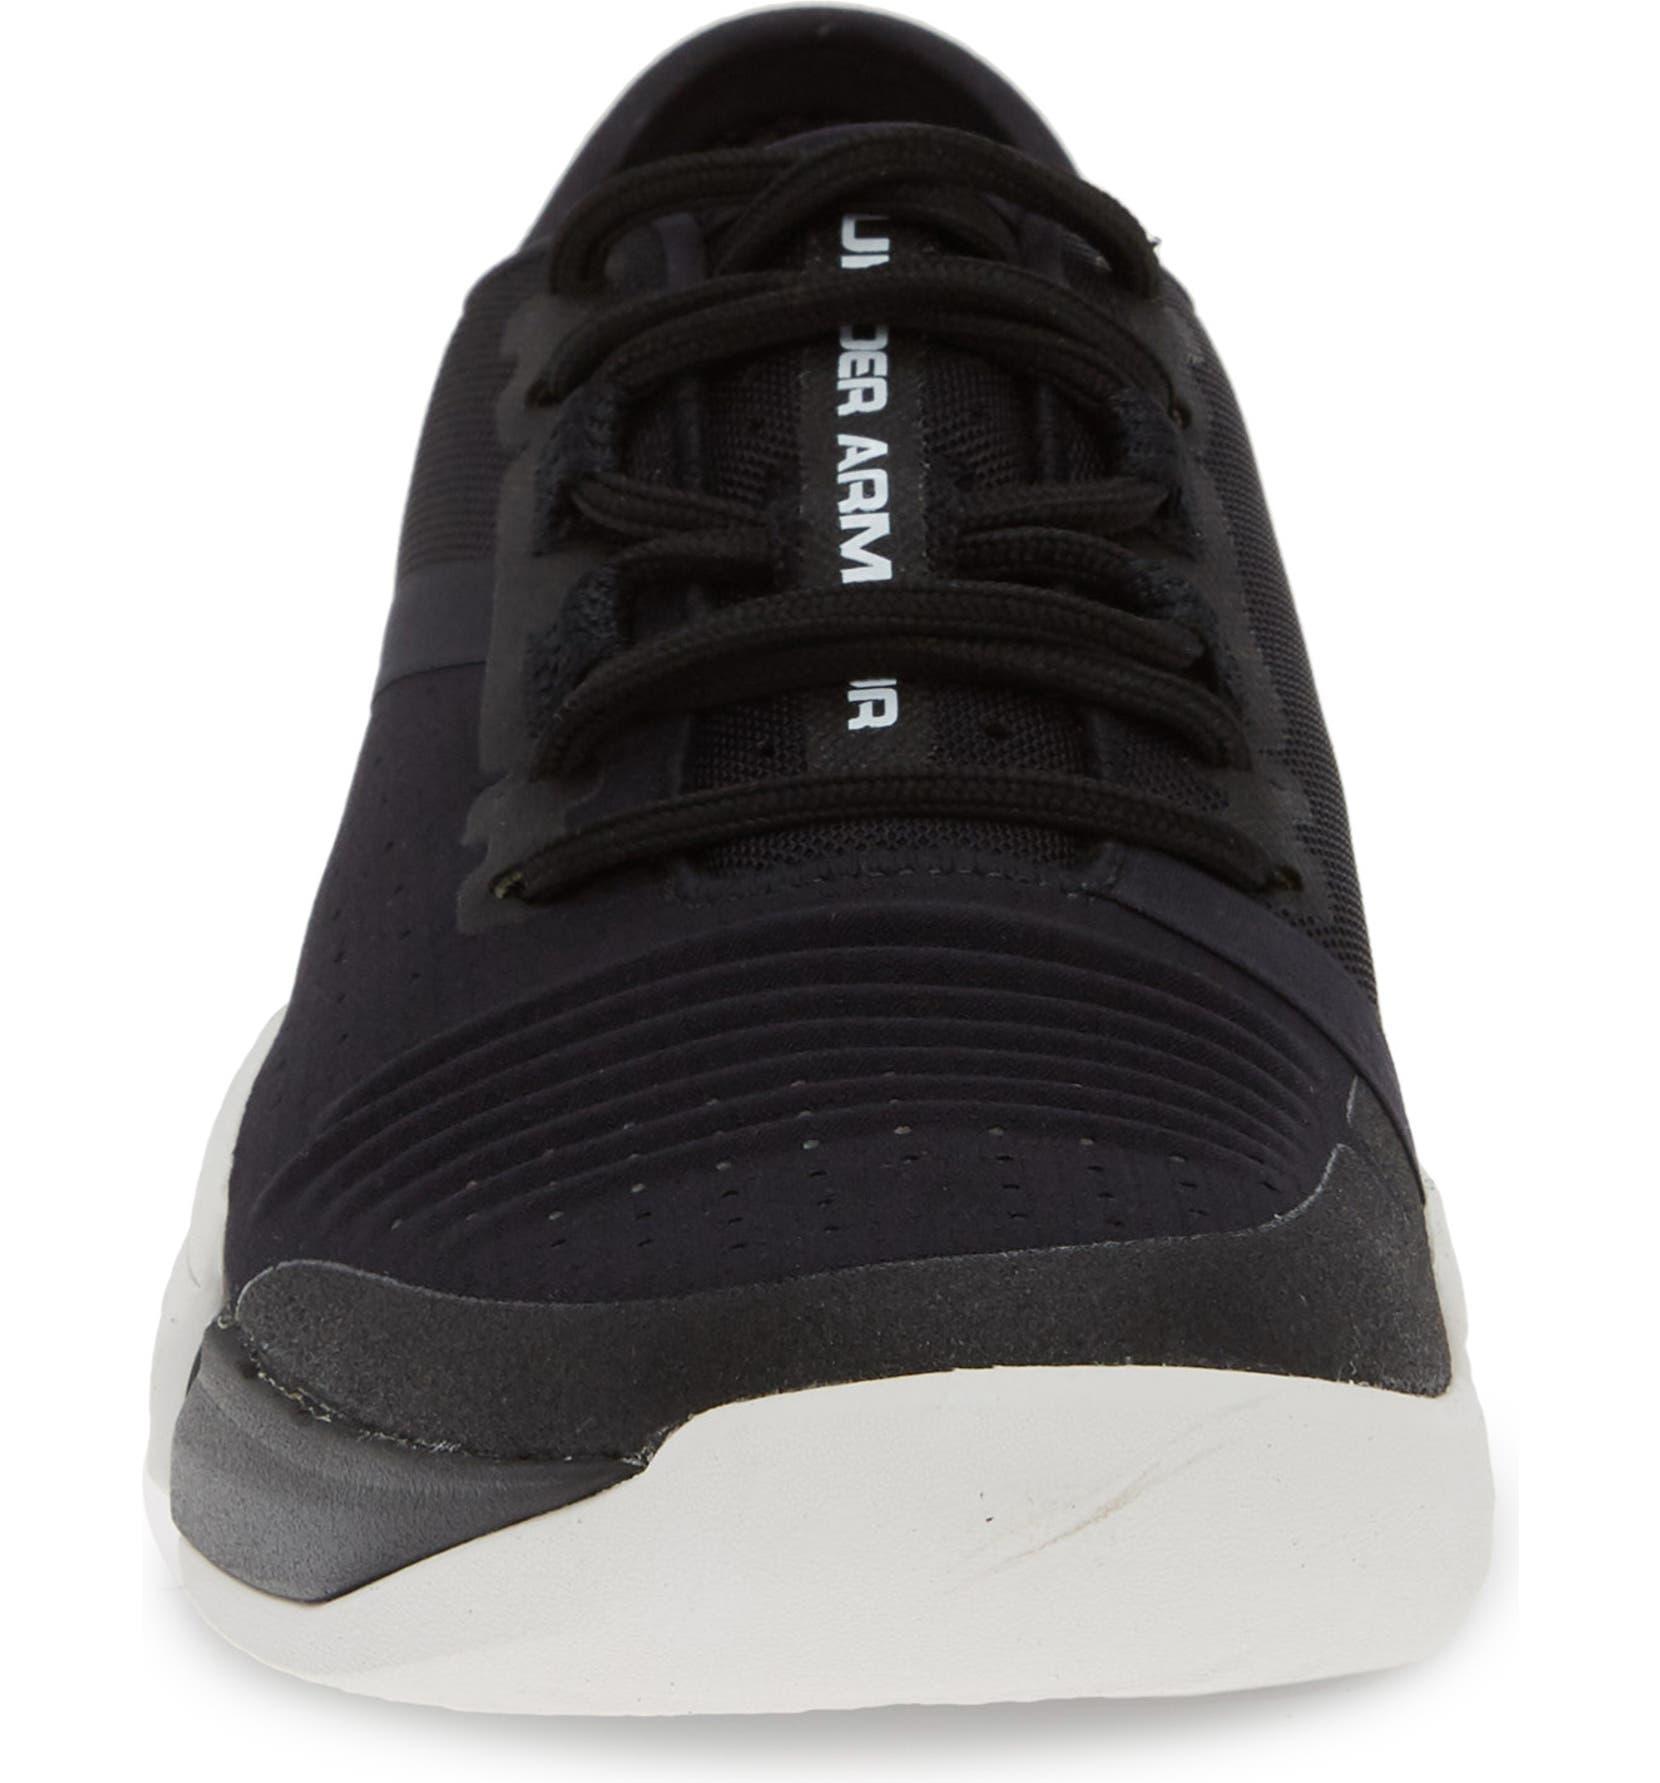 Tribase Reign Training shoe